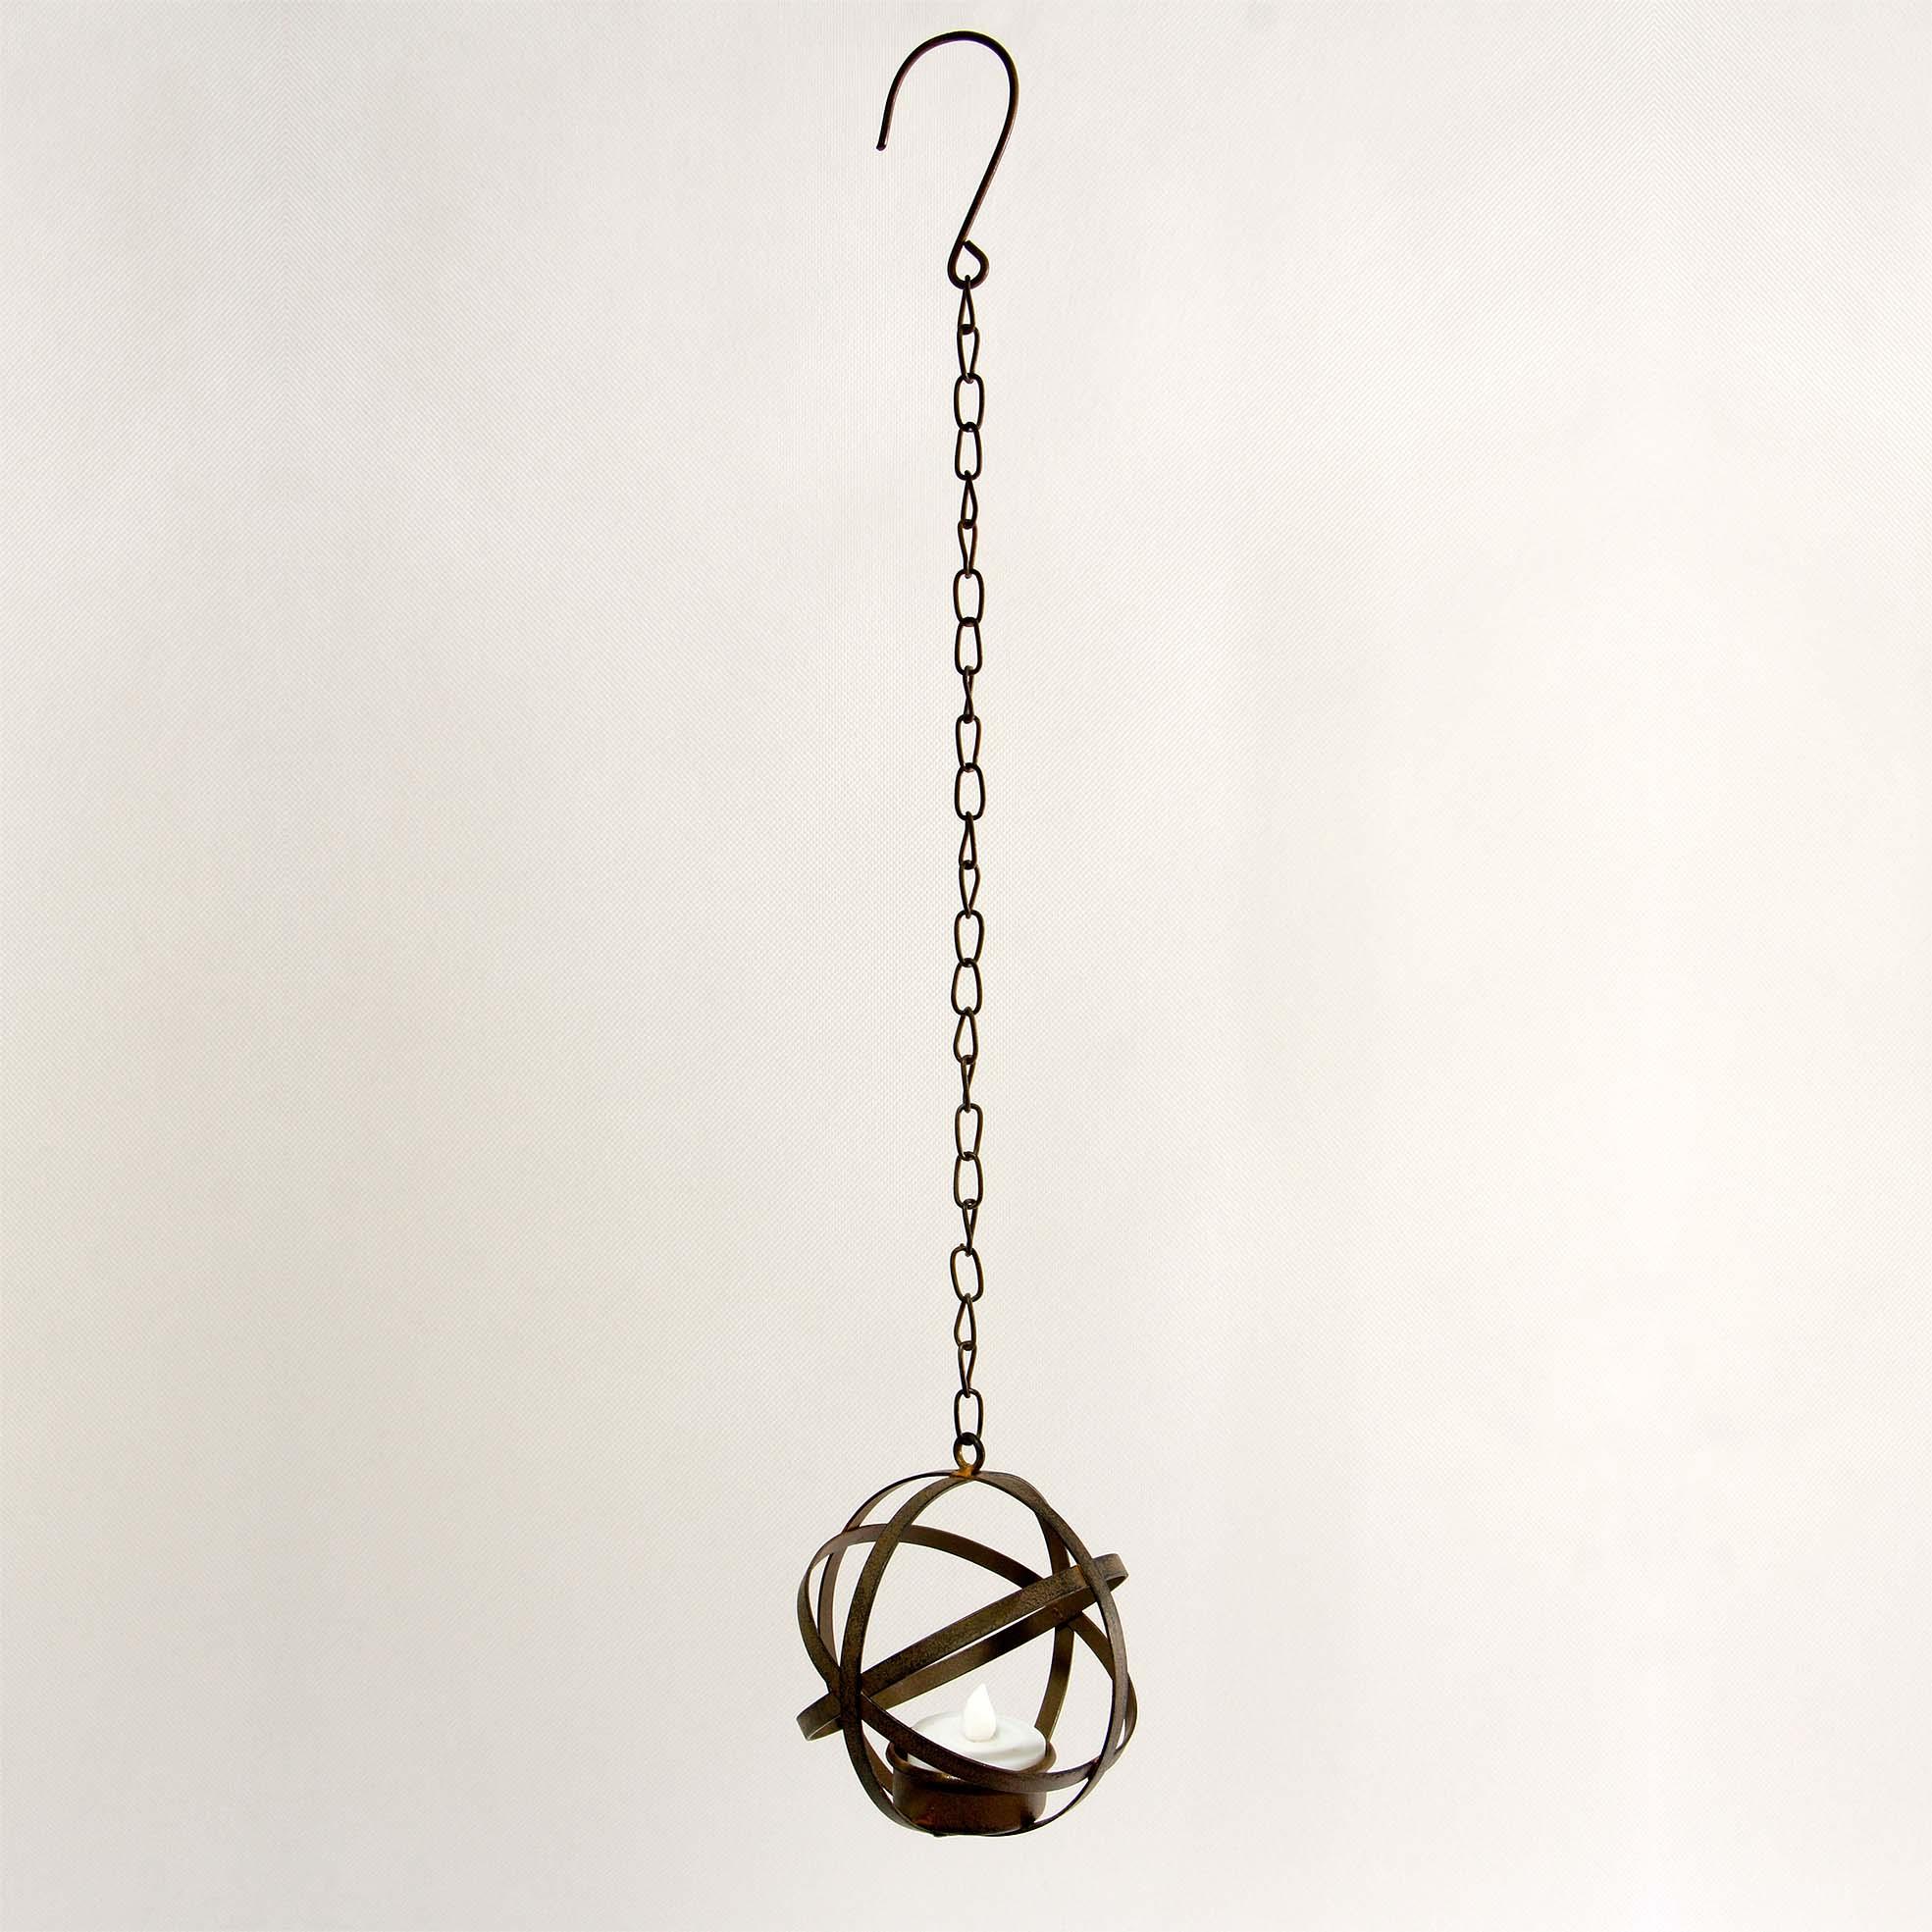 Hanging LED Tea Light Holder  MYHH05026 Featured Image